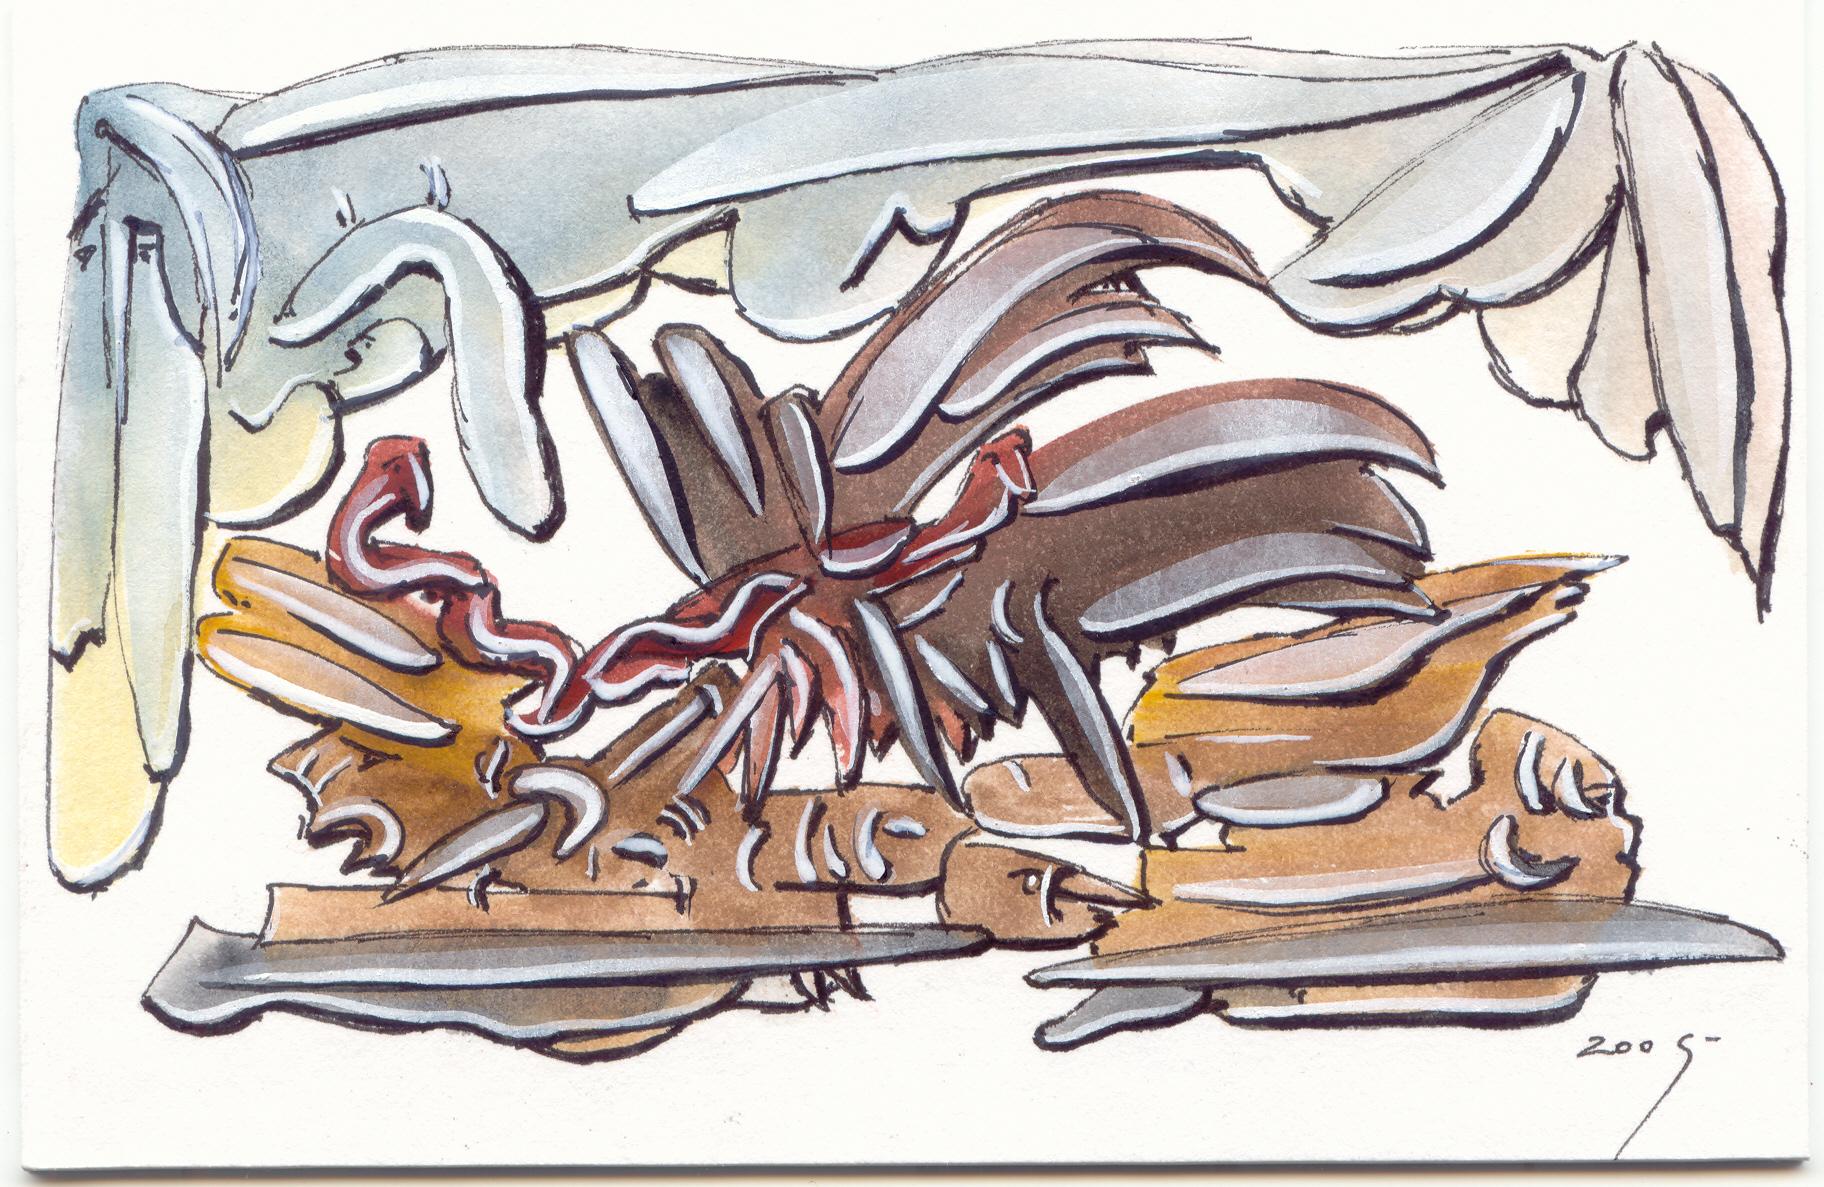 Artecontempo 7 (10x15)2005.jpg